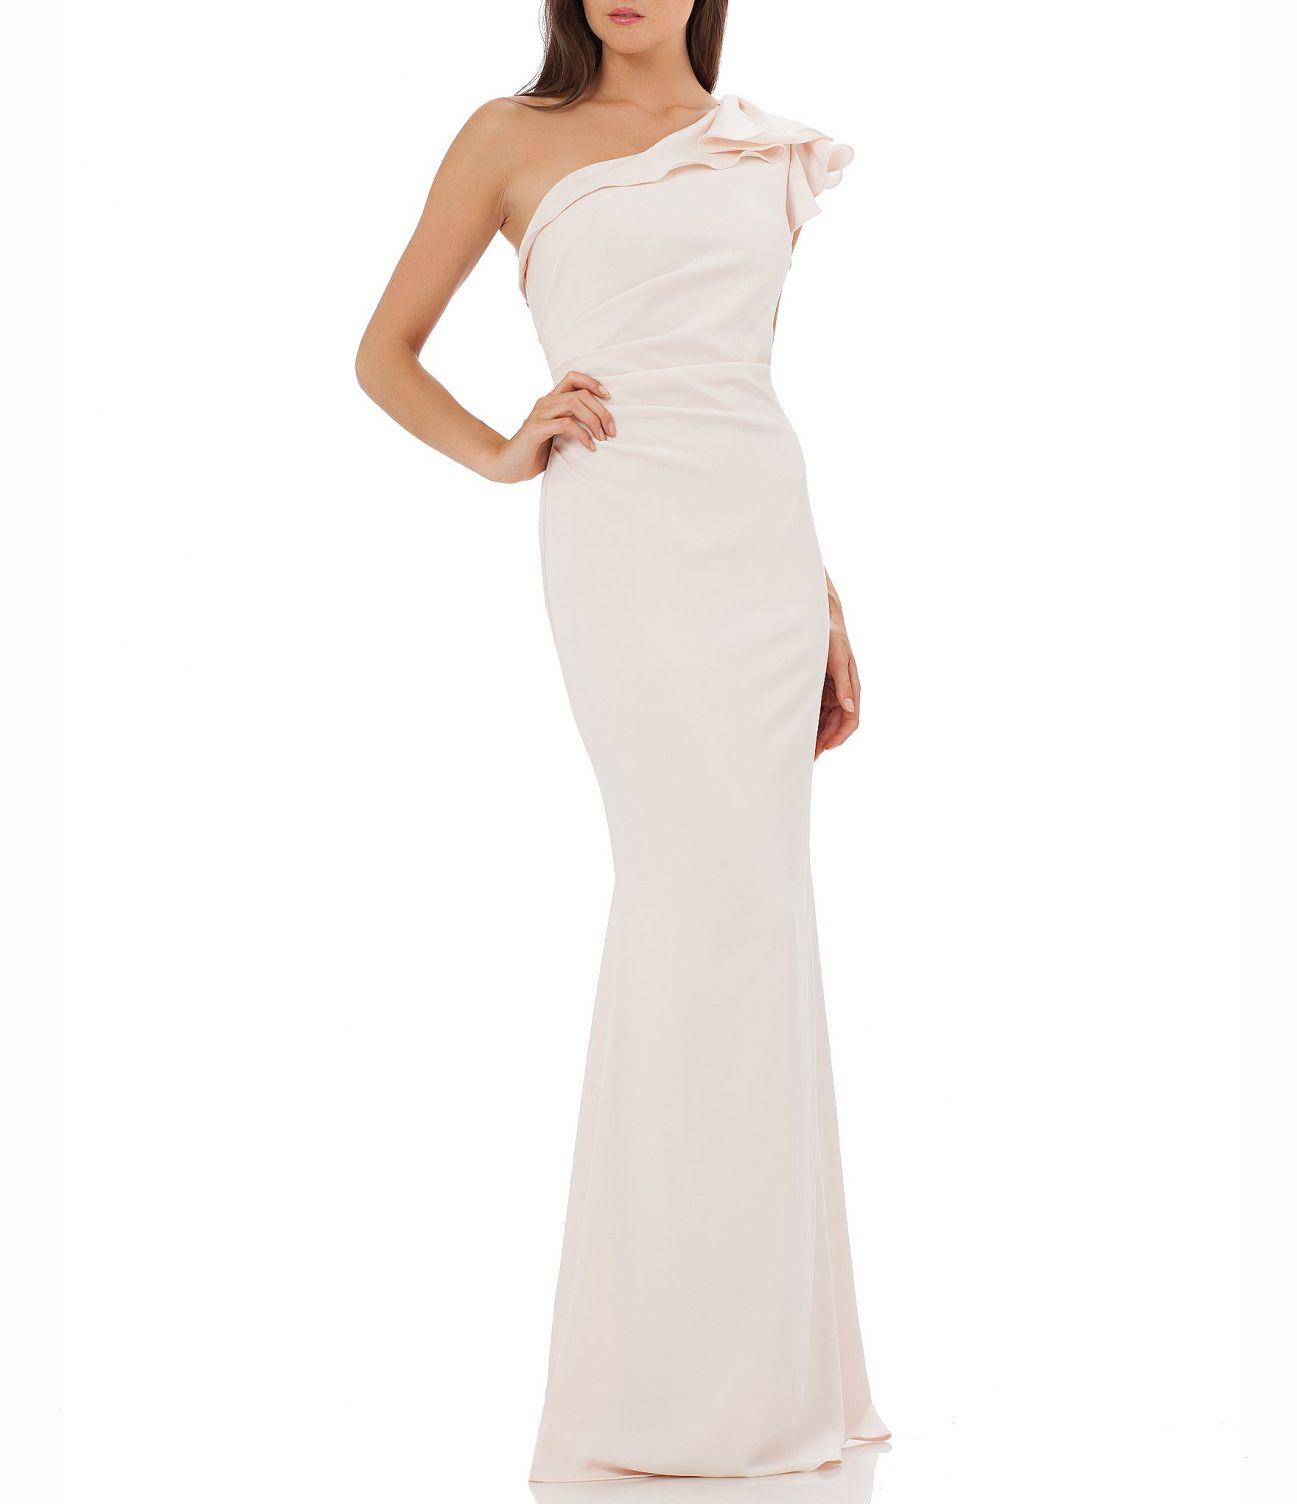 Dillards Wedding Dresses Ivory - Wedding Dresses for Plus Size Check ...